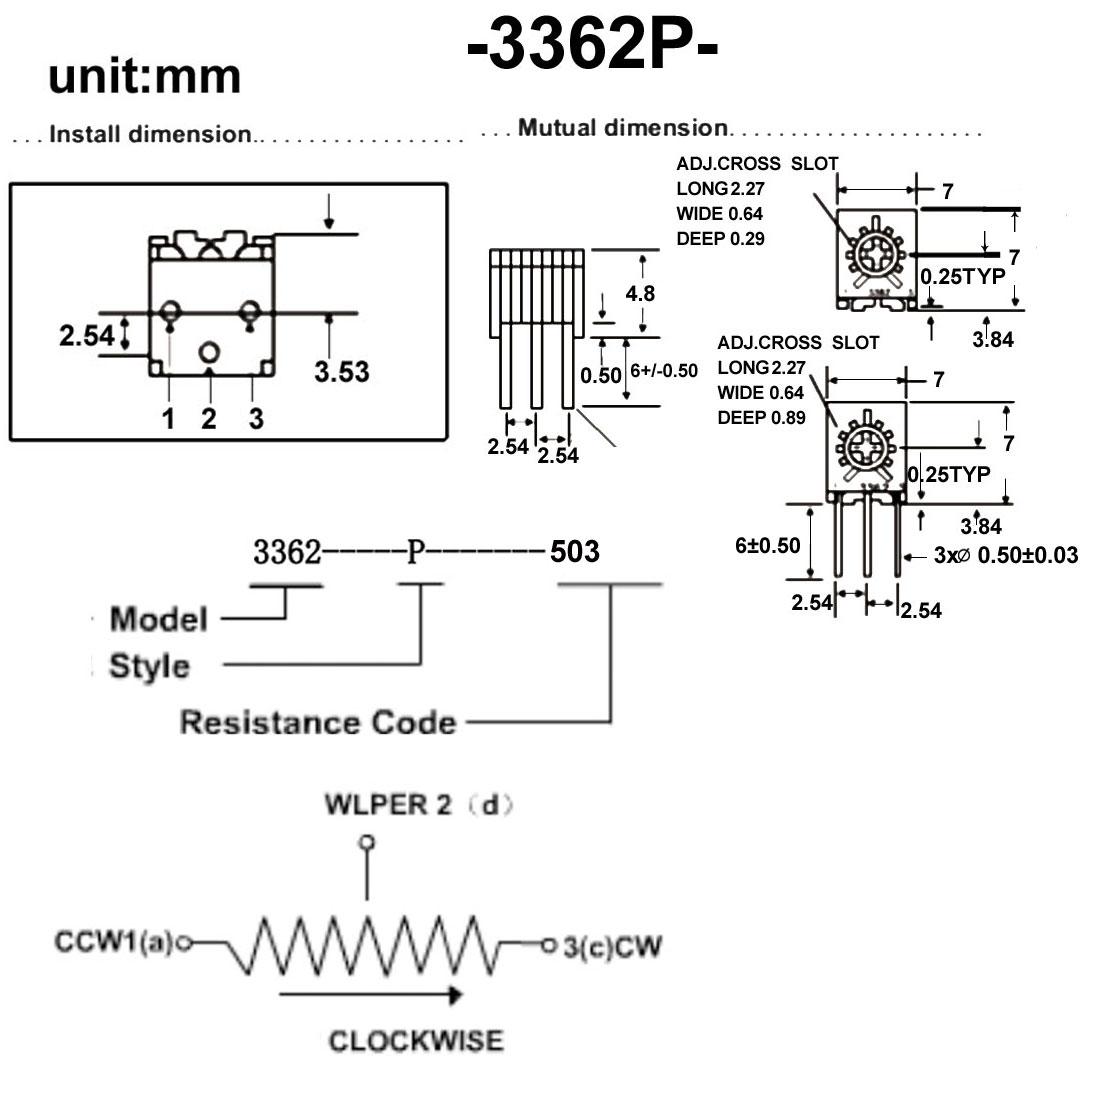 Resistors 50k Ohm Top Adjustment Horizontal Cermet Potentiometer 2 Pcs - image 2 of 6